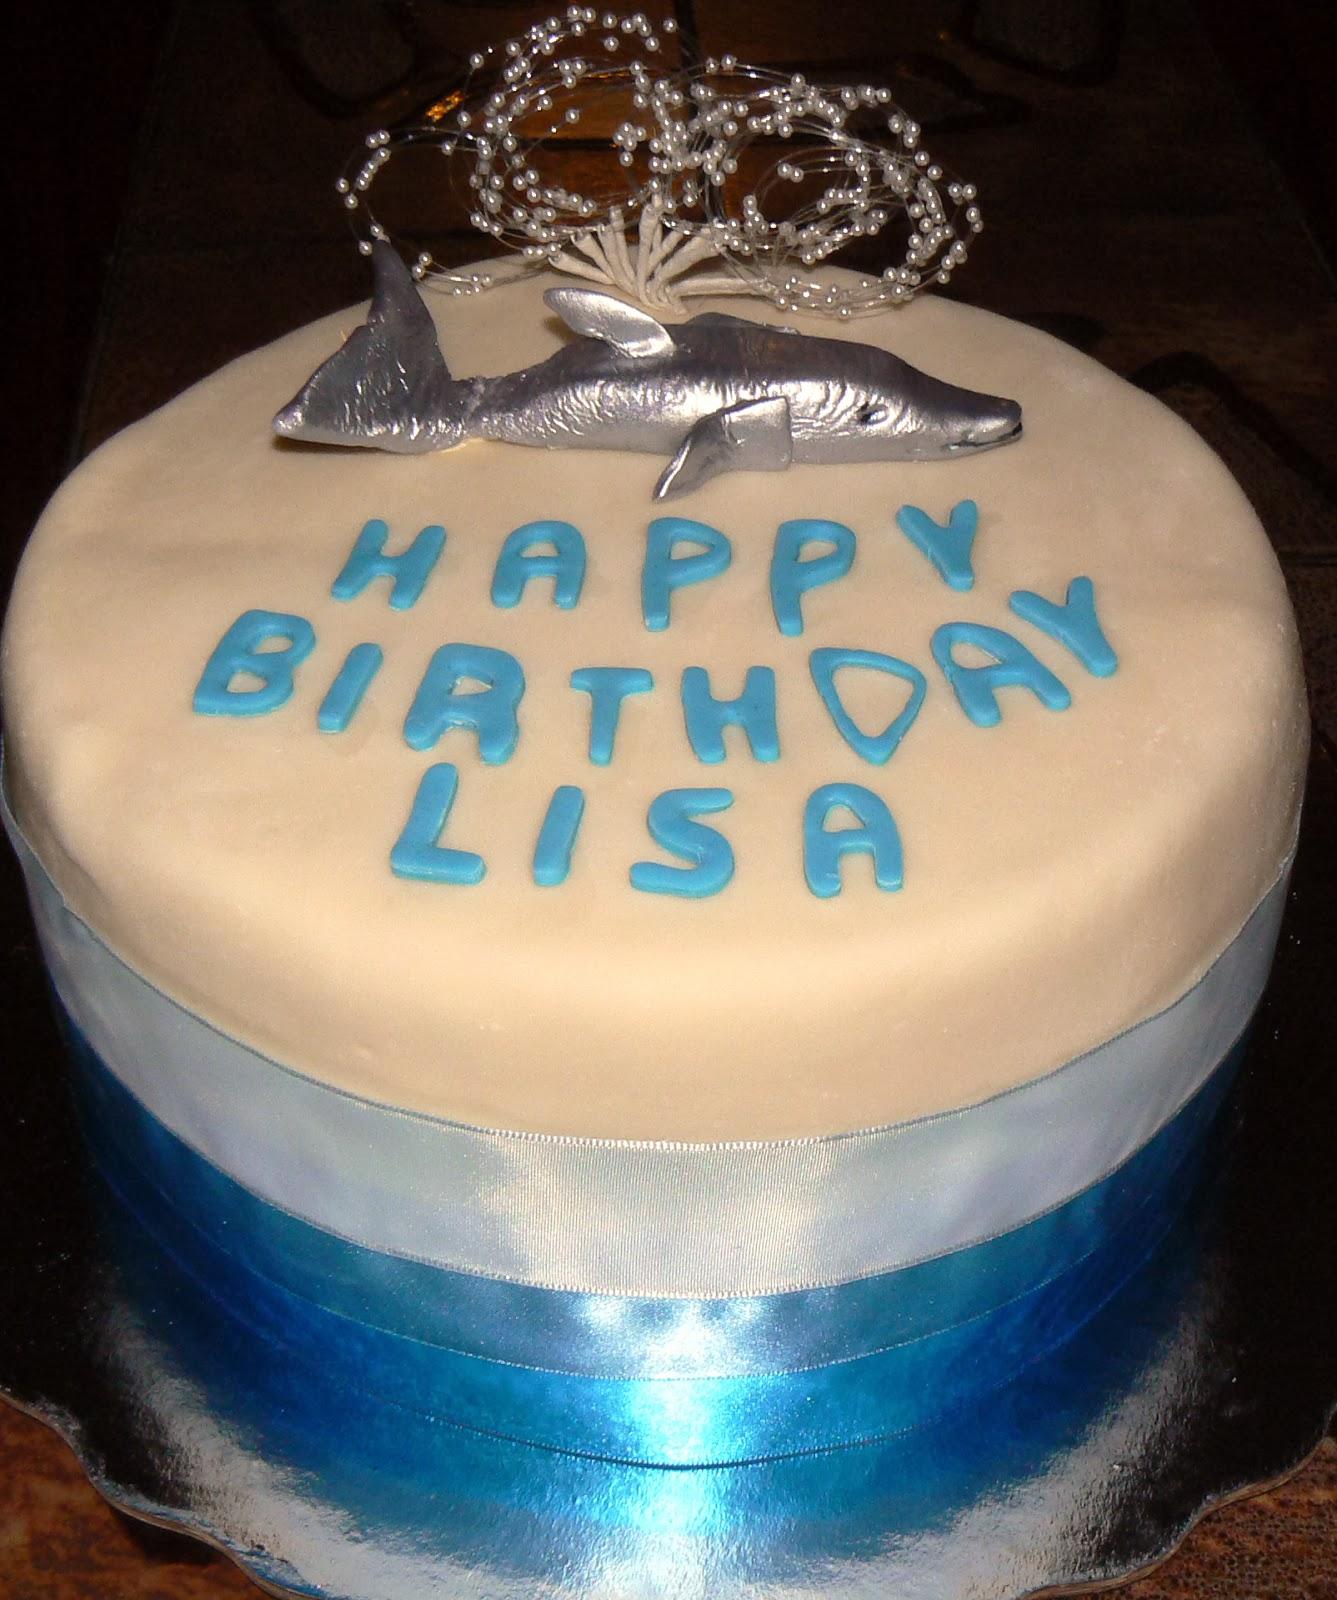 Pasteles De La Paz Happy Birthday Lisa